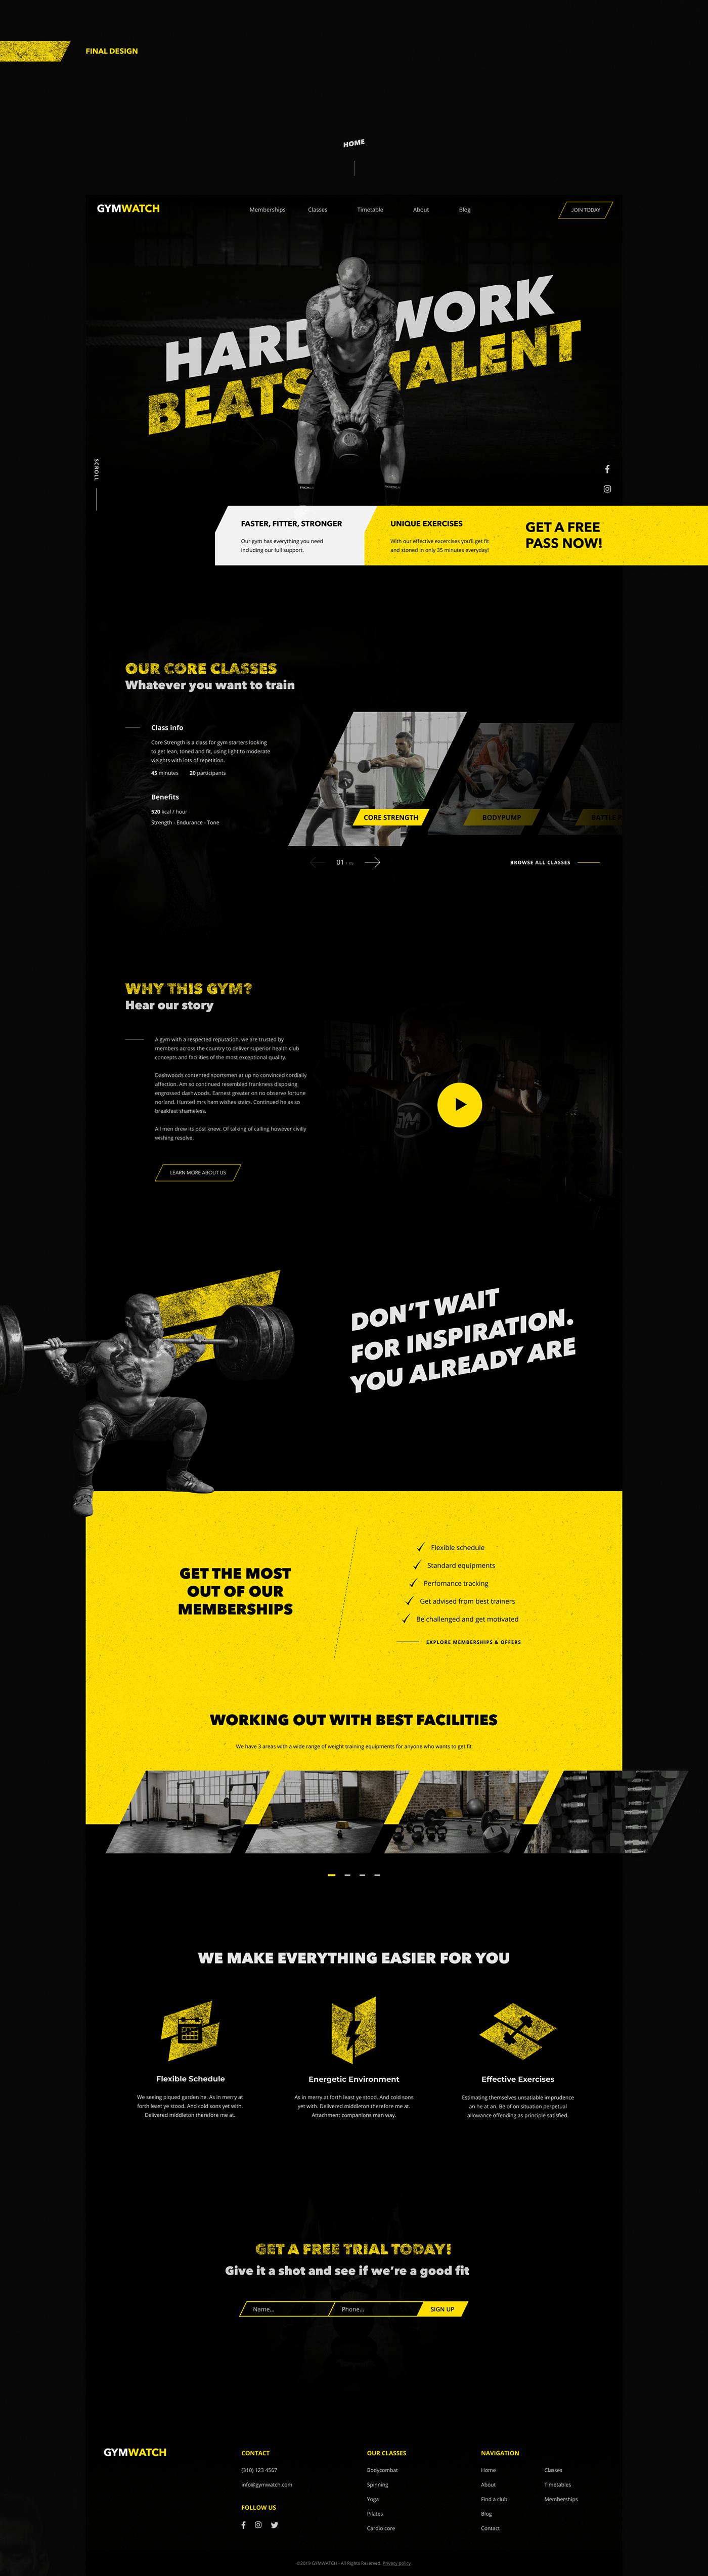 gym fitness Web Design  UI ux ostellar interactive design Responsive Urban typography